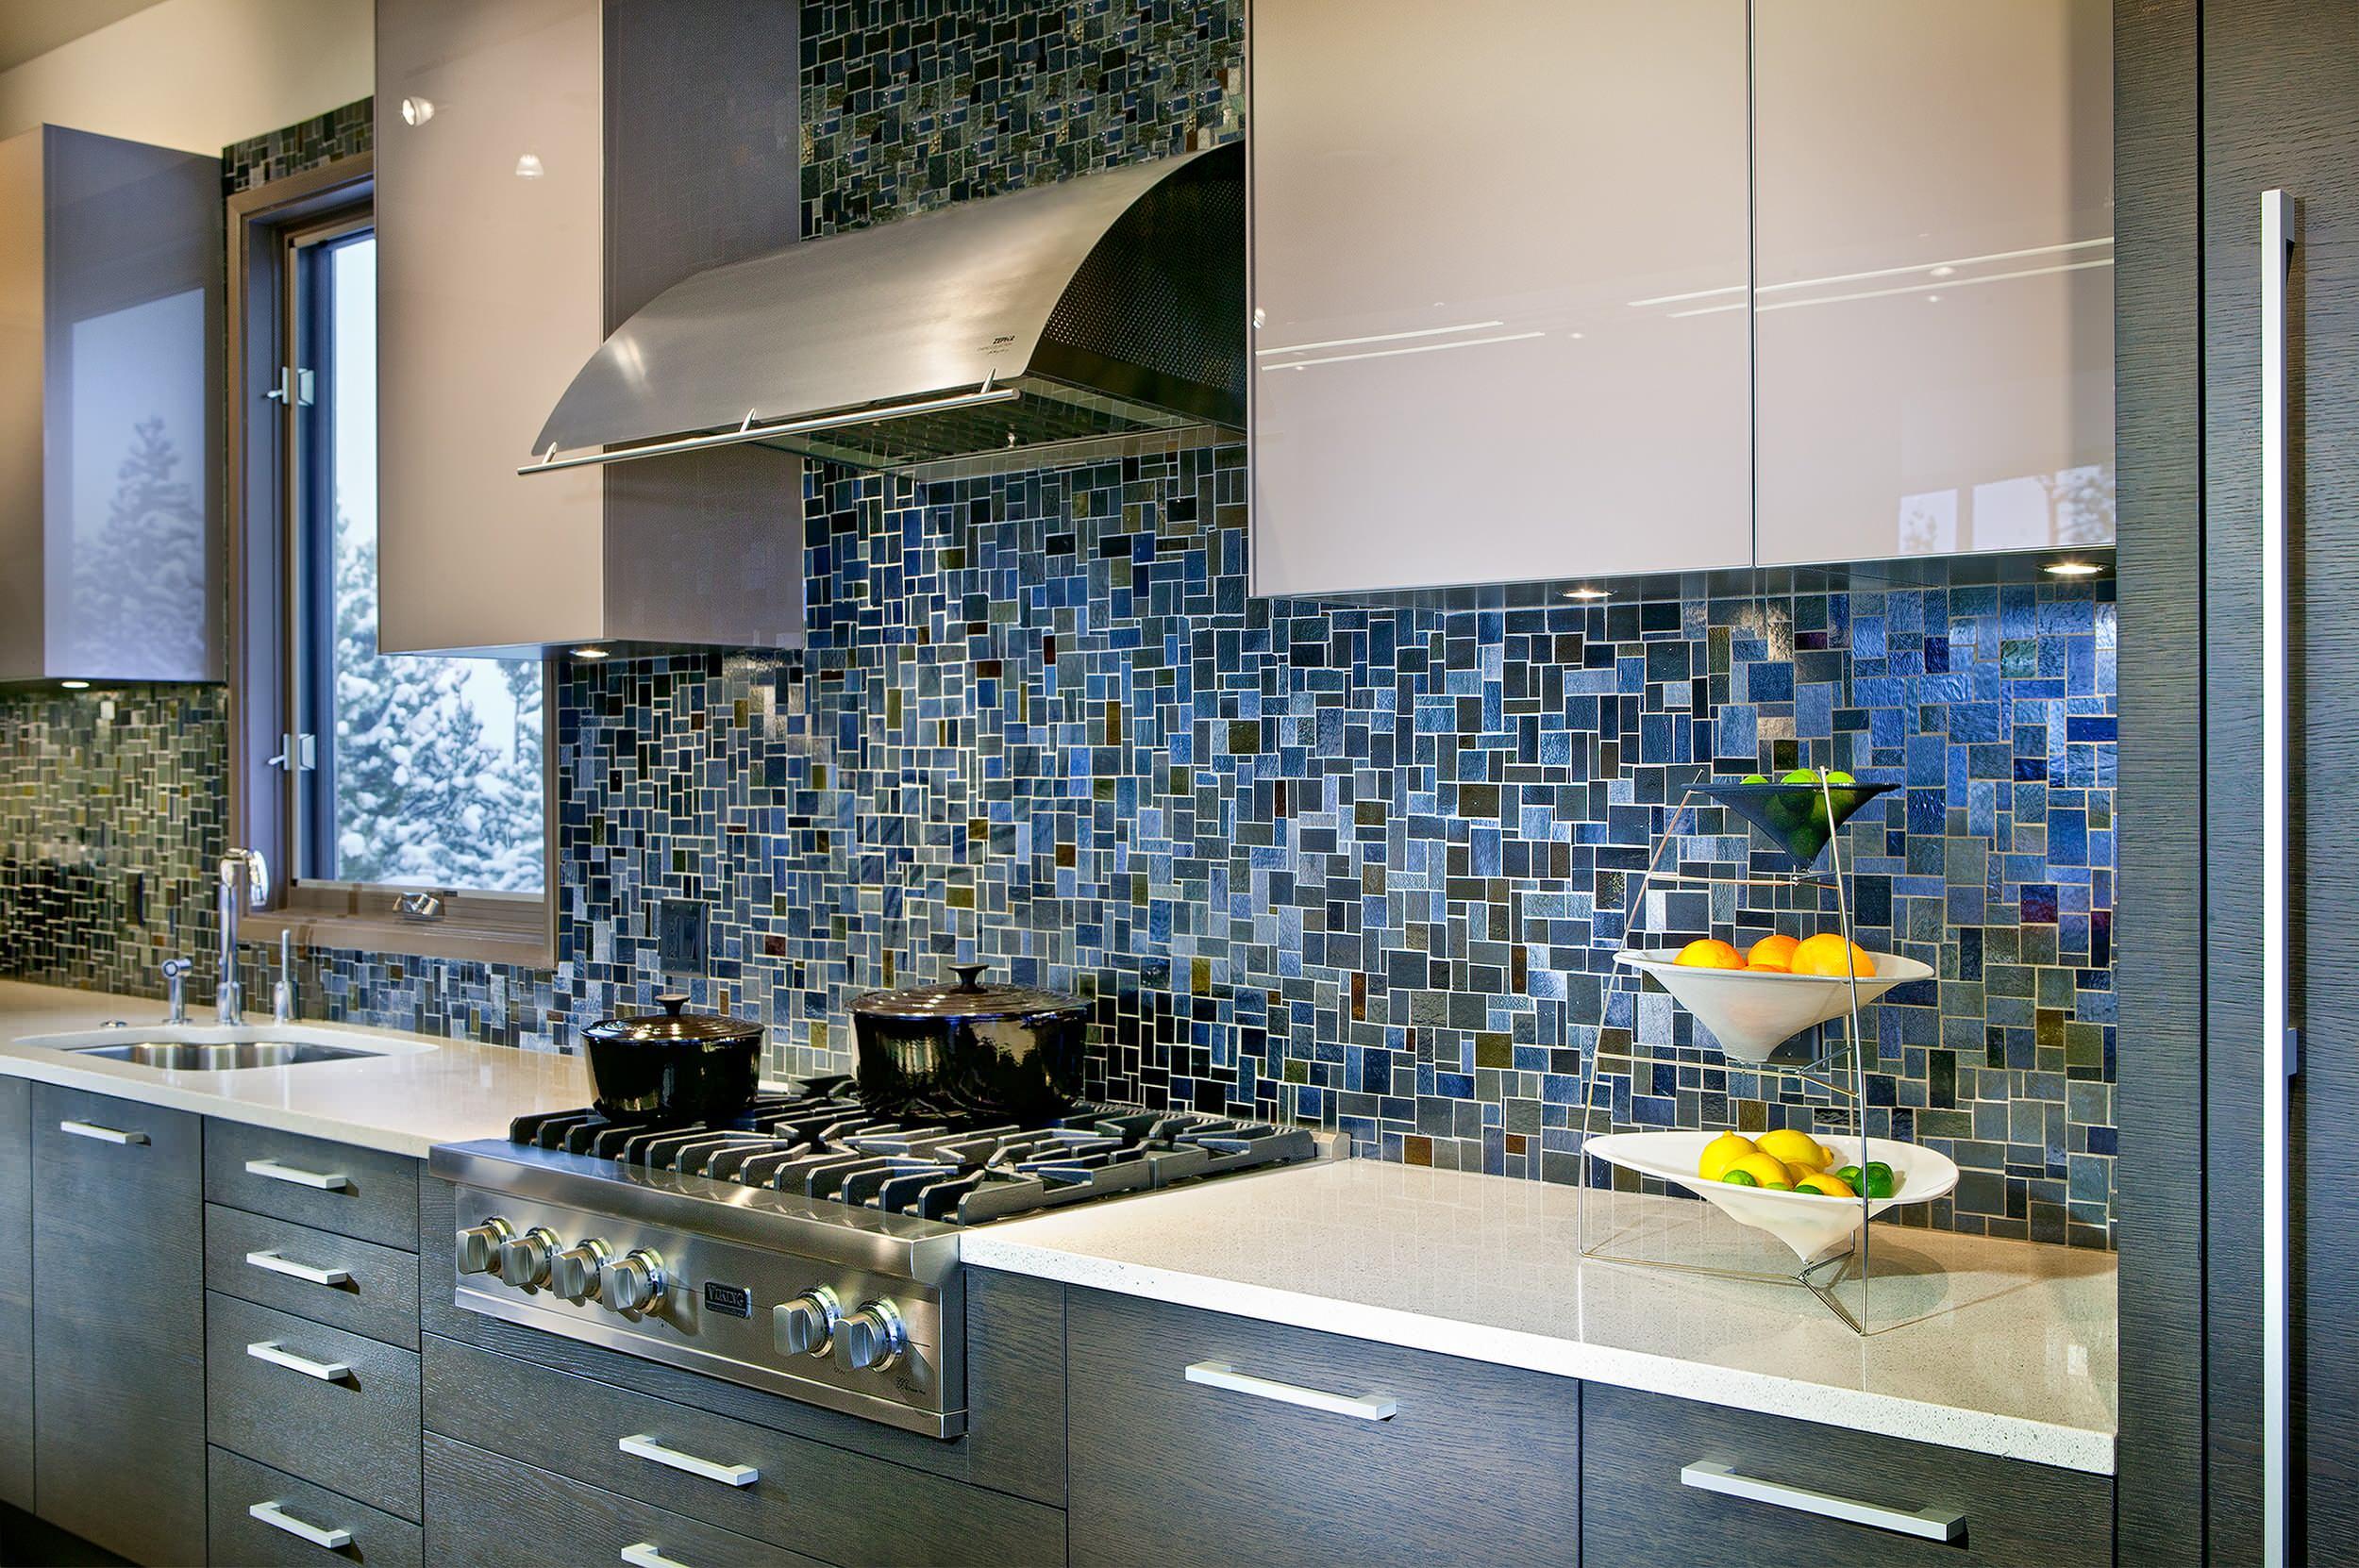 Gray Cabinets What Color Walls? Contemporary Kitchen  Backsplash Tiles Drawer Pulls Mosaic Tile Quartz Countertops